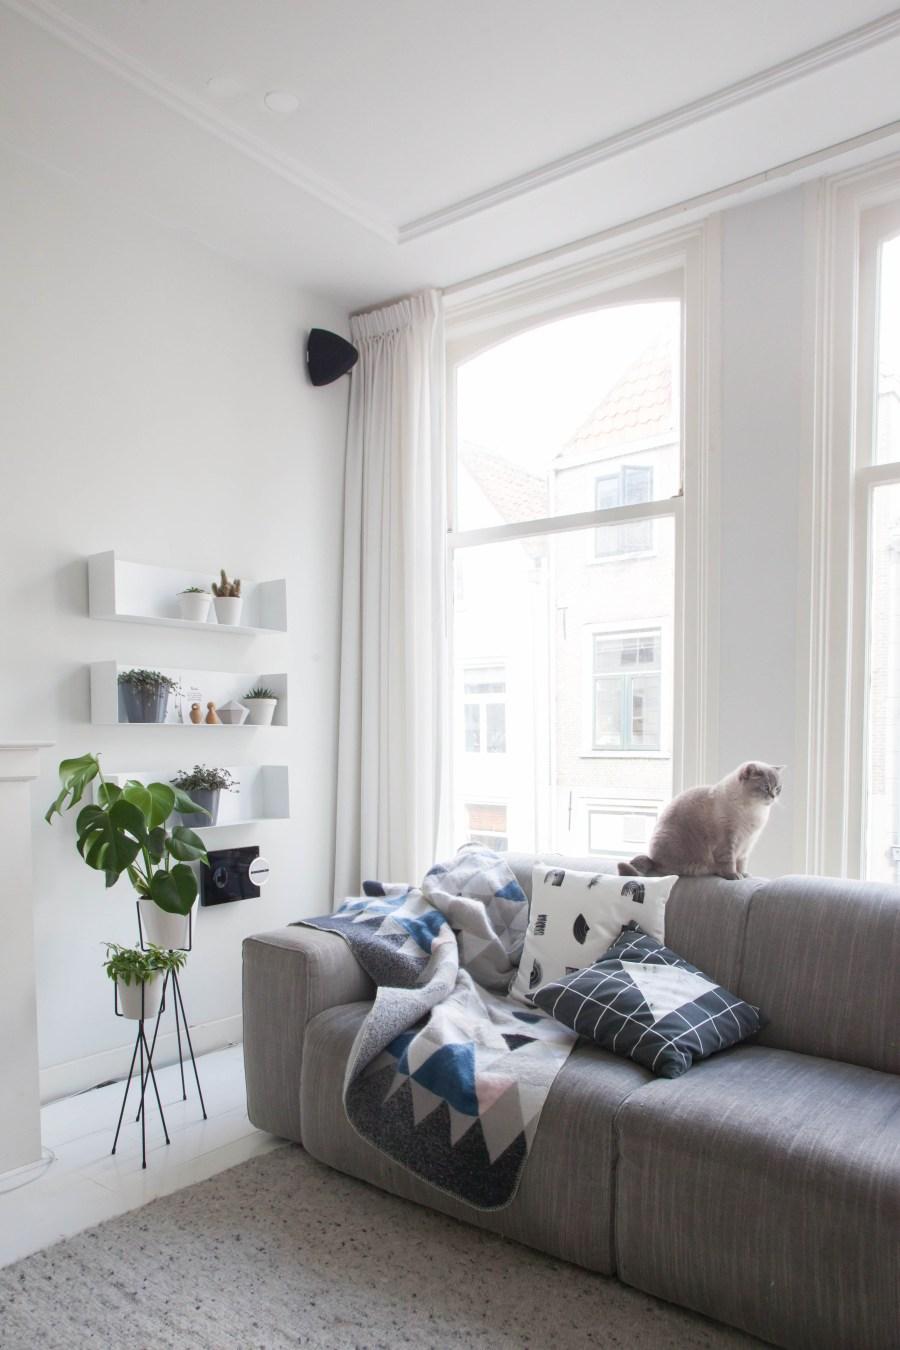 Studio LileSadi - minimalist design